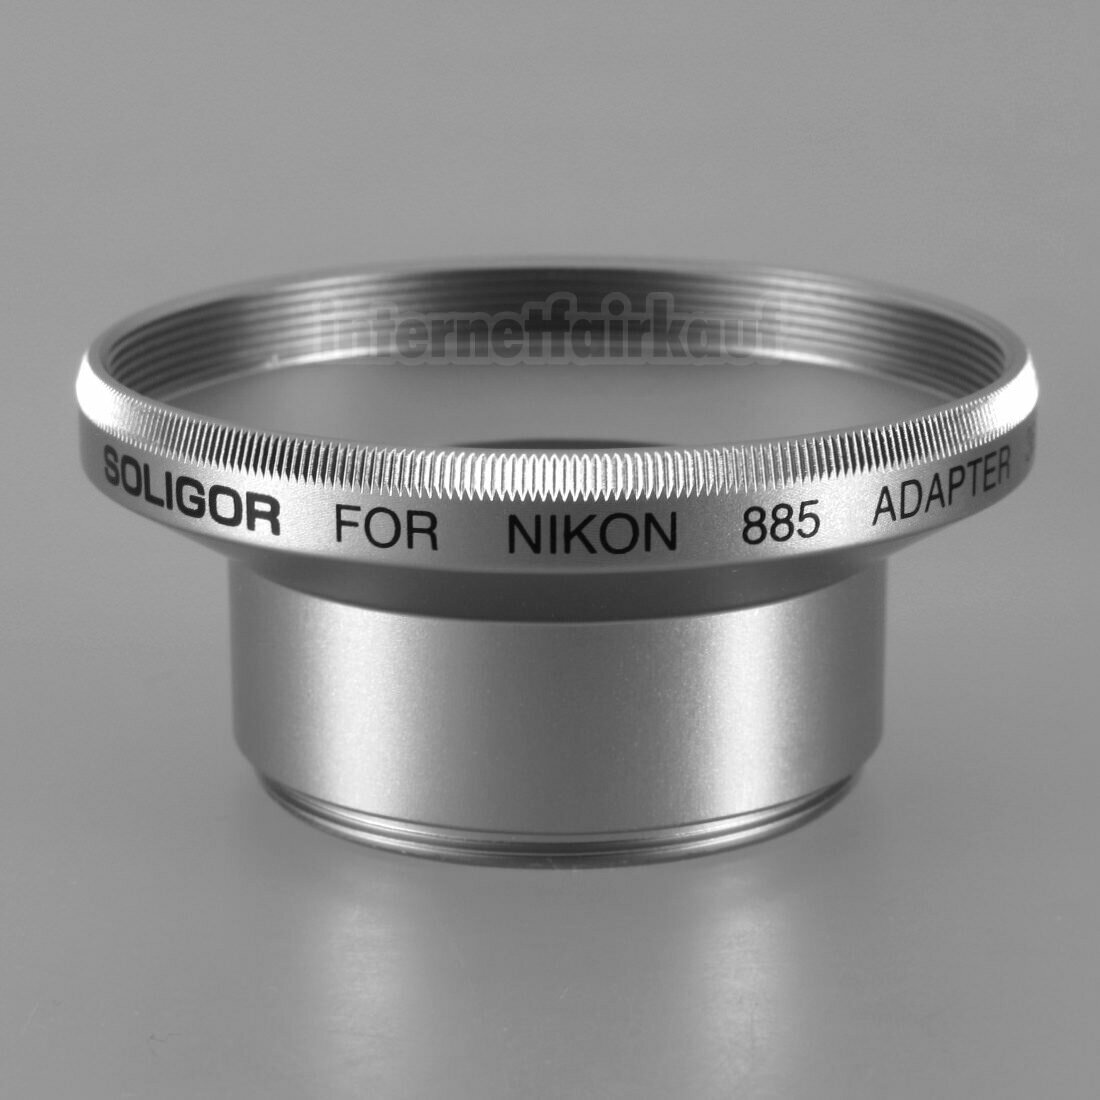 Adapter Tubus für Nikon Coolpix 885 4300